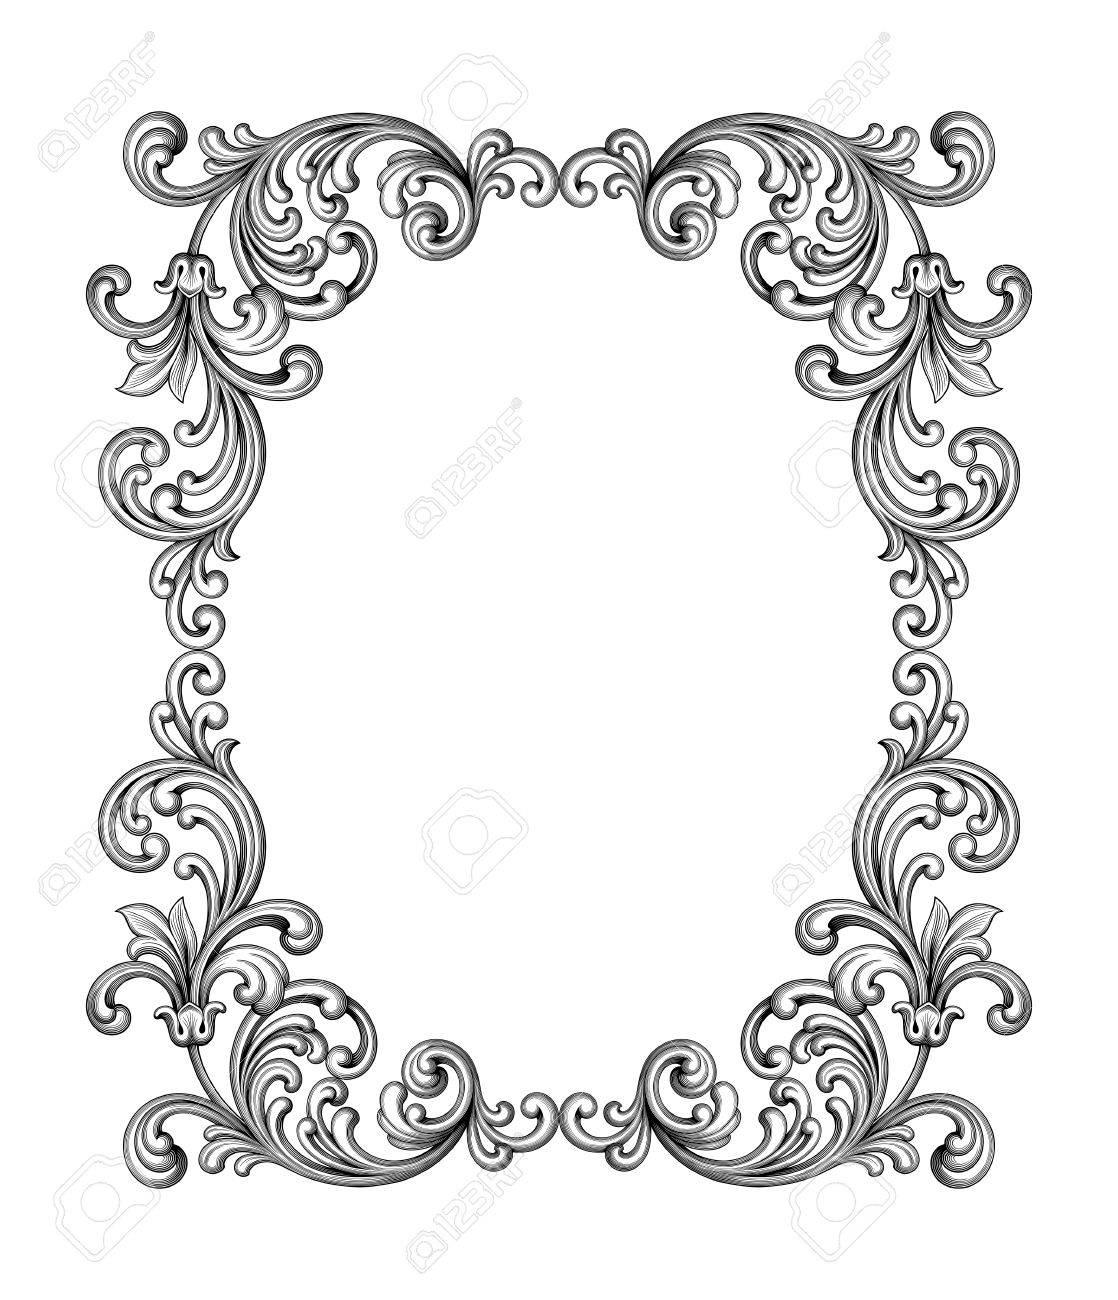 Vintage Baroque Victorian frame border monogram floral ornament leaf scroll engraved retro flower pattern decorative design tattoo black and white filigree calligraphic vector heraldic shield swirl - 55459140